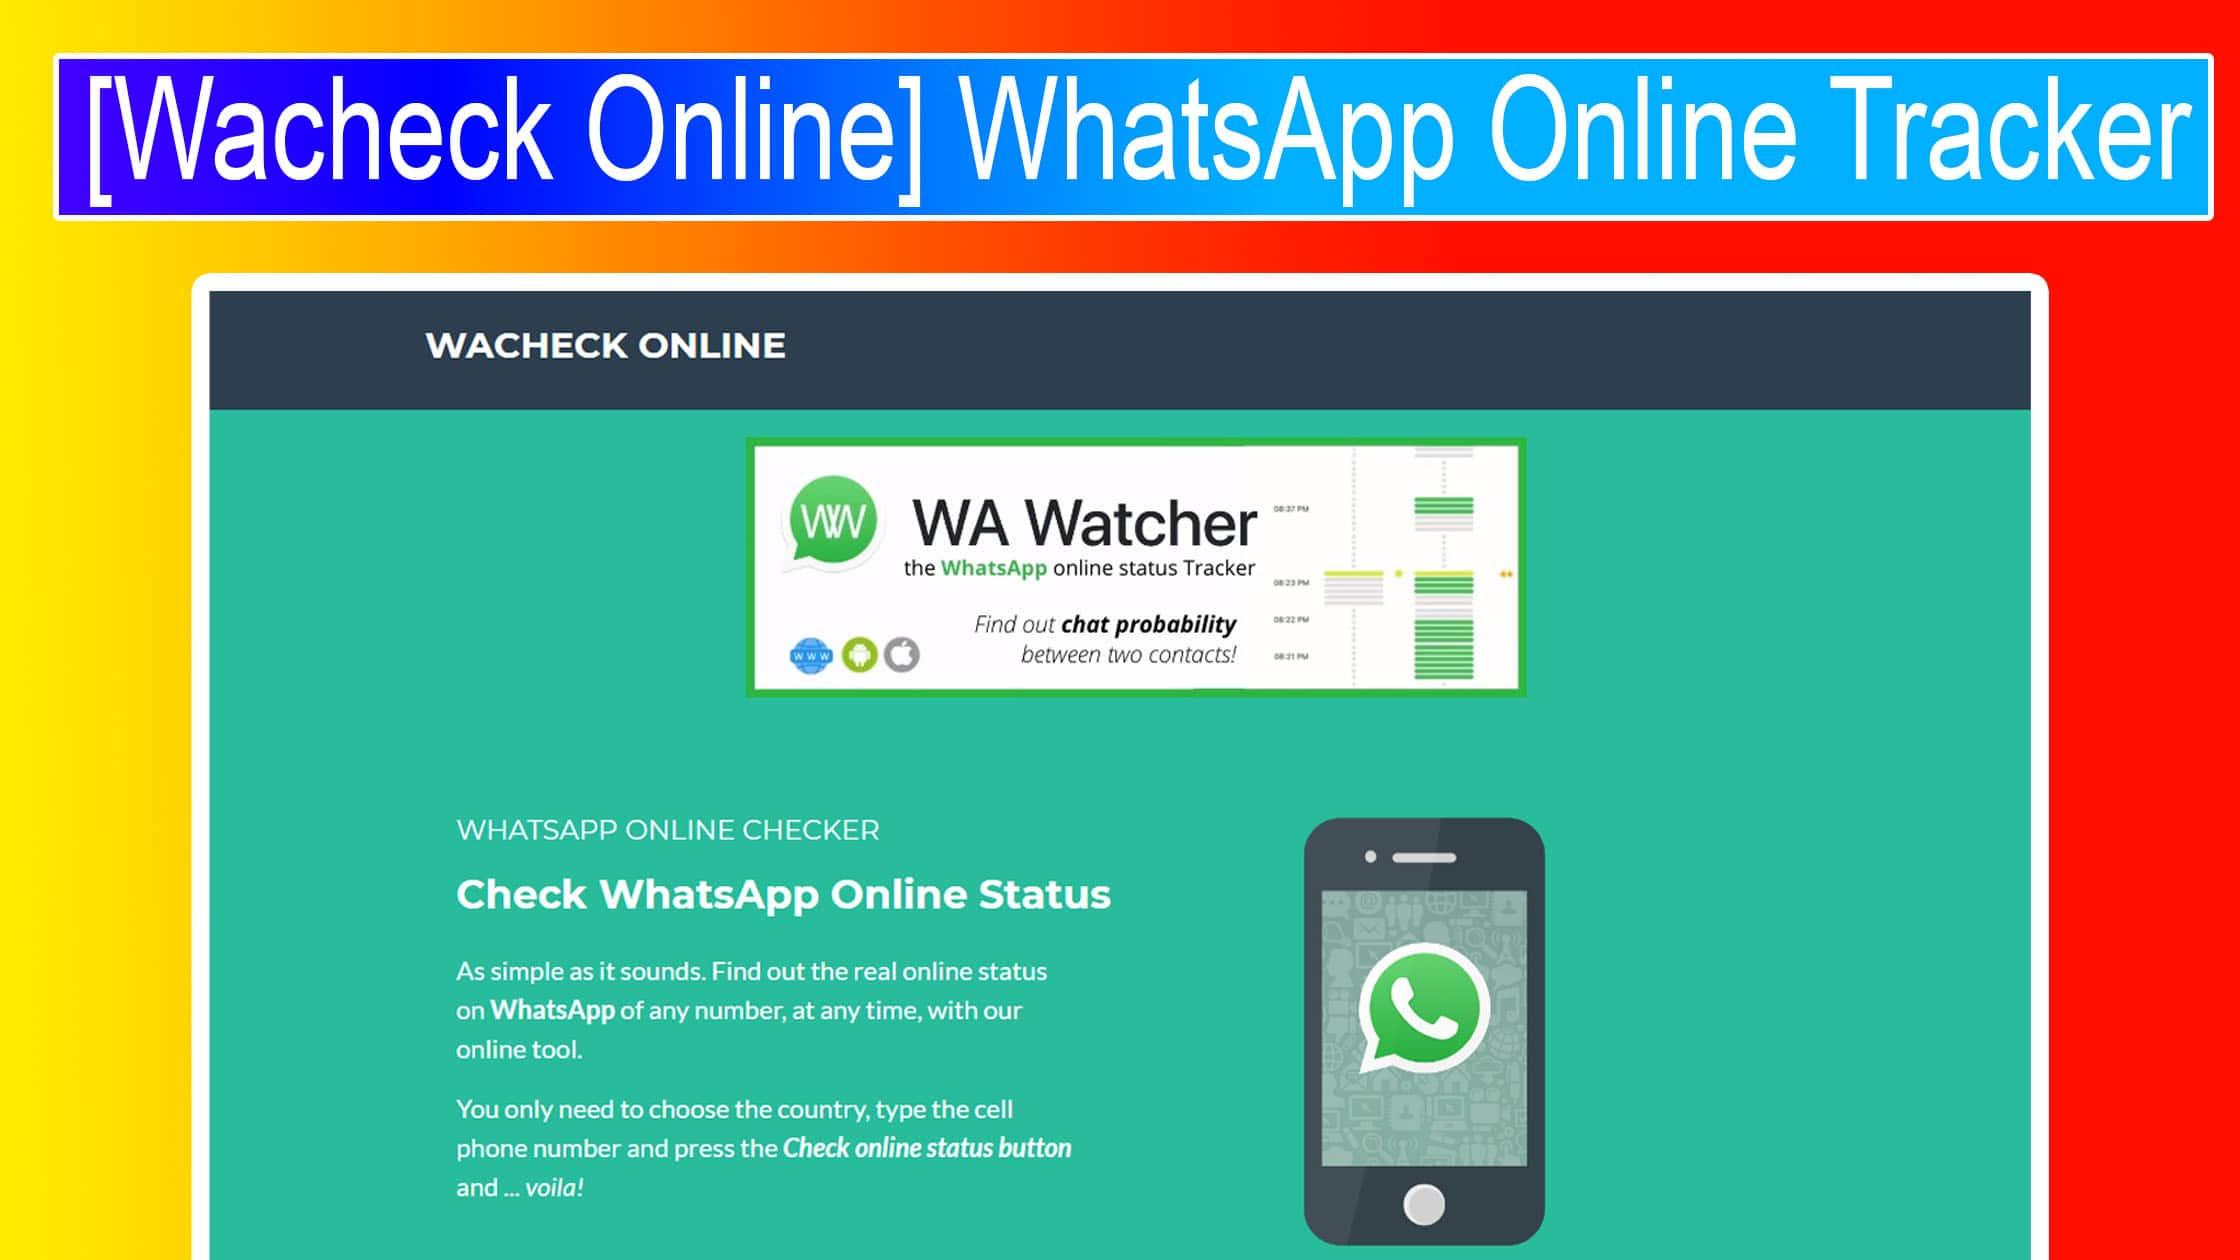 [Wacheck Online] WhatsApp Online Tracker